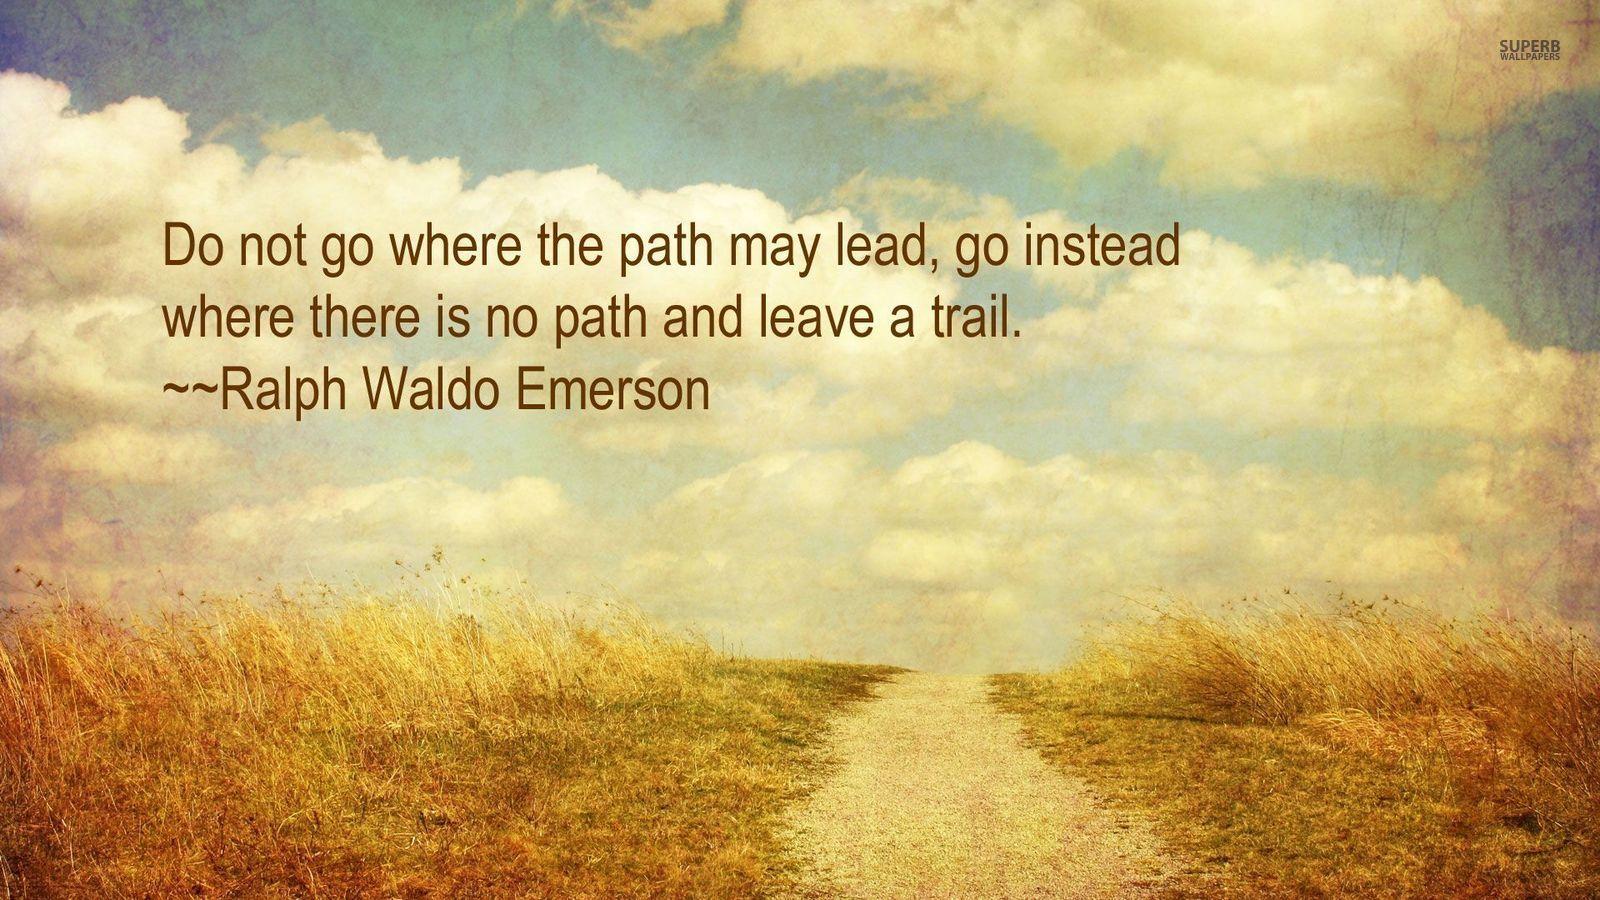 Leave a Trail   Advice Wallpaper 38740635 1600x900